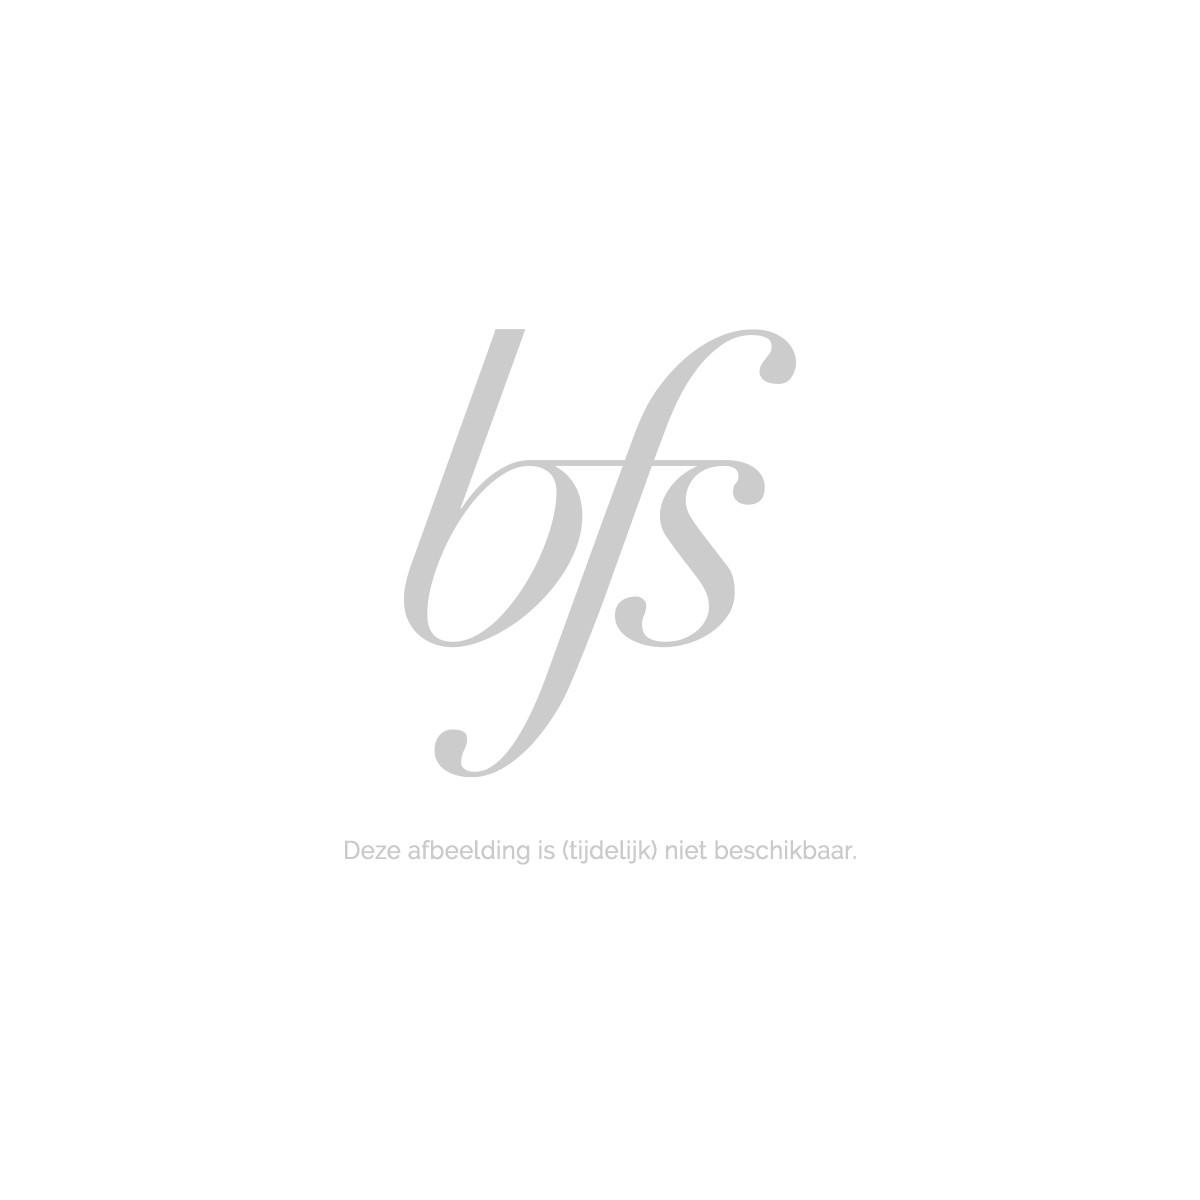 Yves Saint Laurent Mascara Vinyl Couture Volume Colour Impact 6,70 Ml